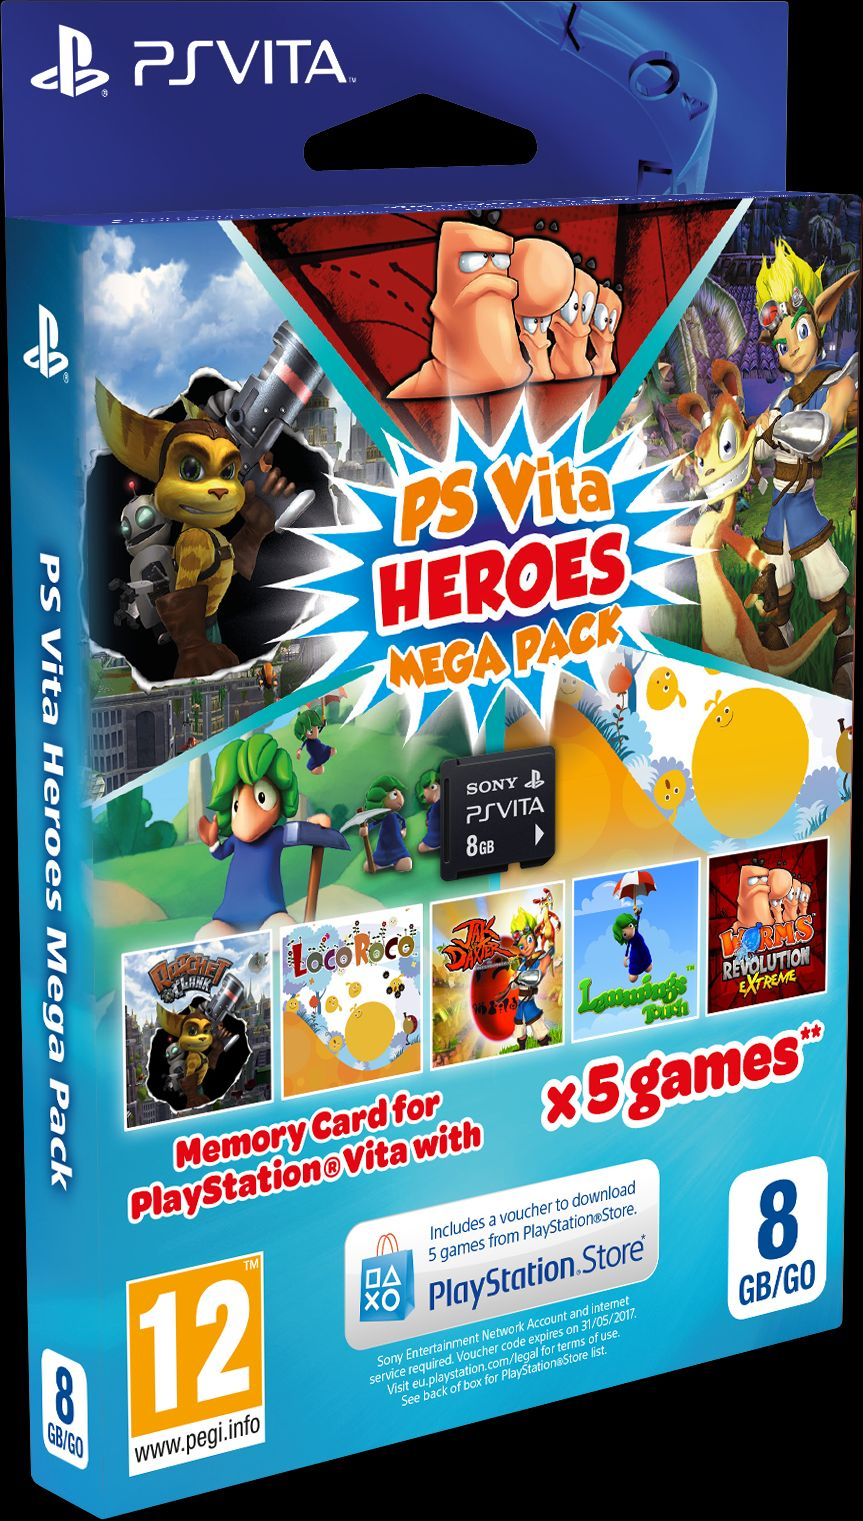 PS Vita Heroes Mega Pack arrives in European stores next